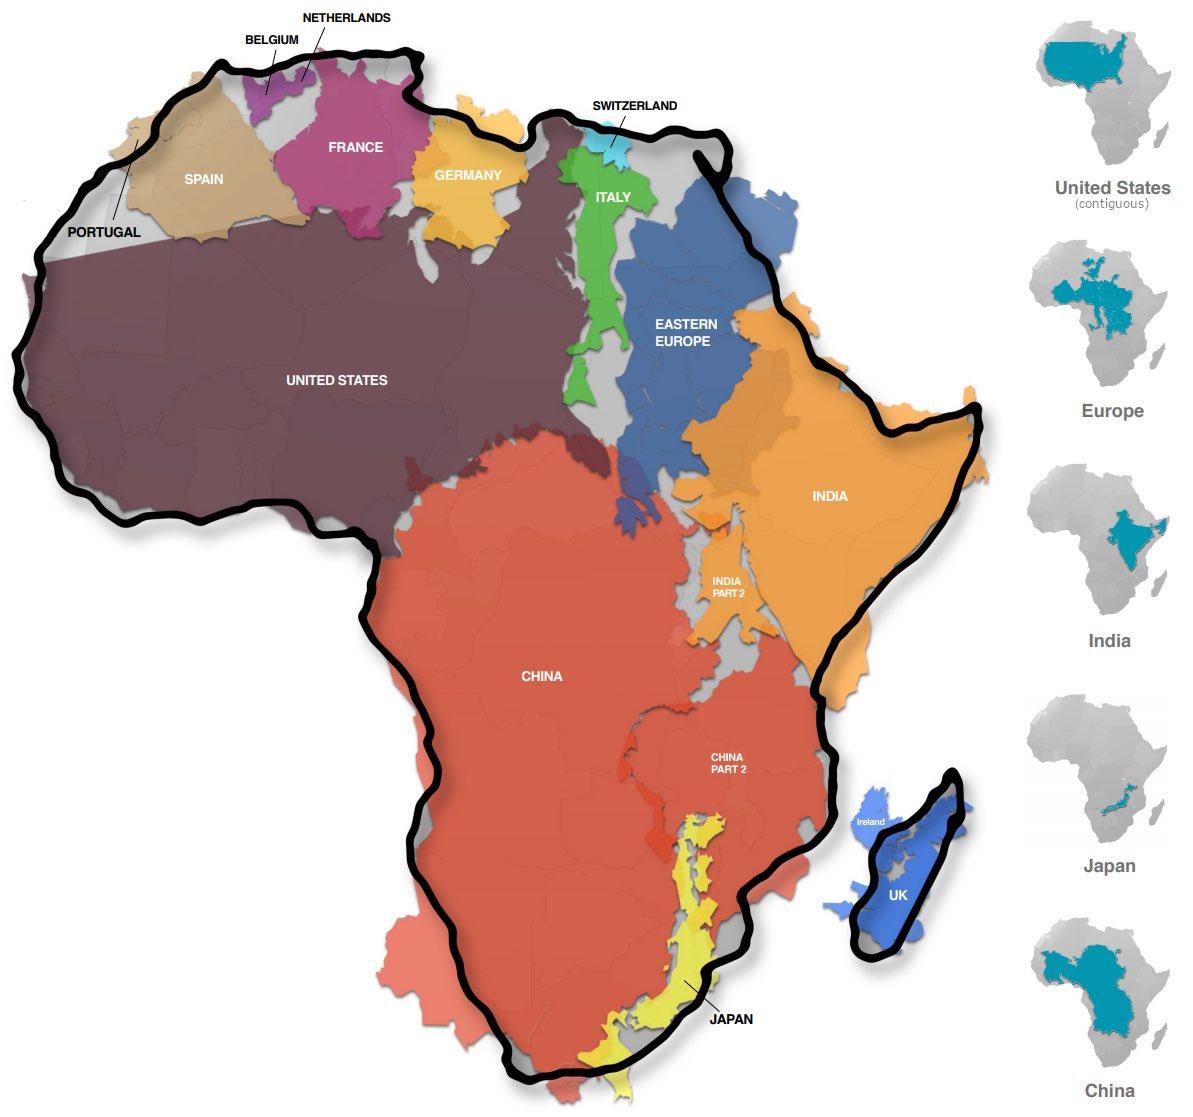 Africa is massive